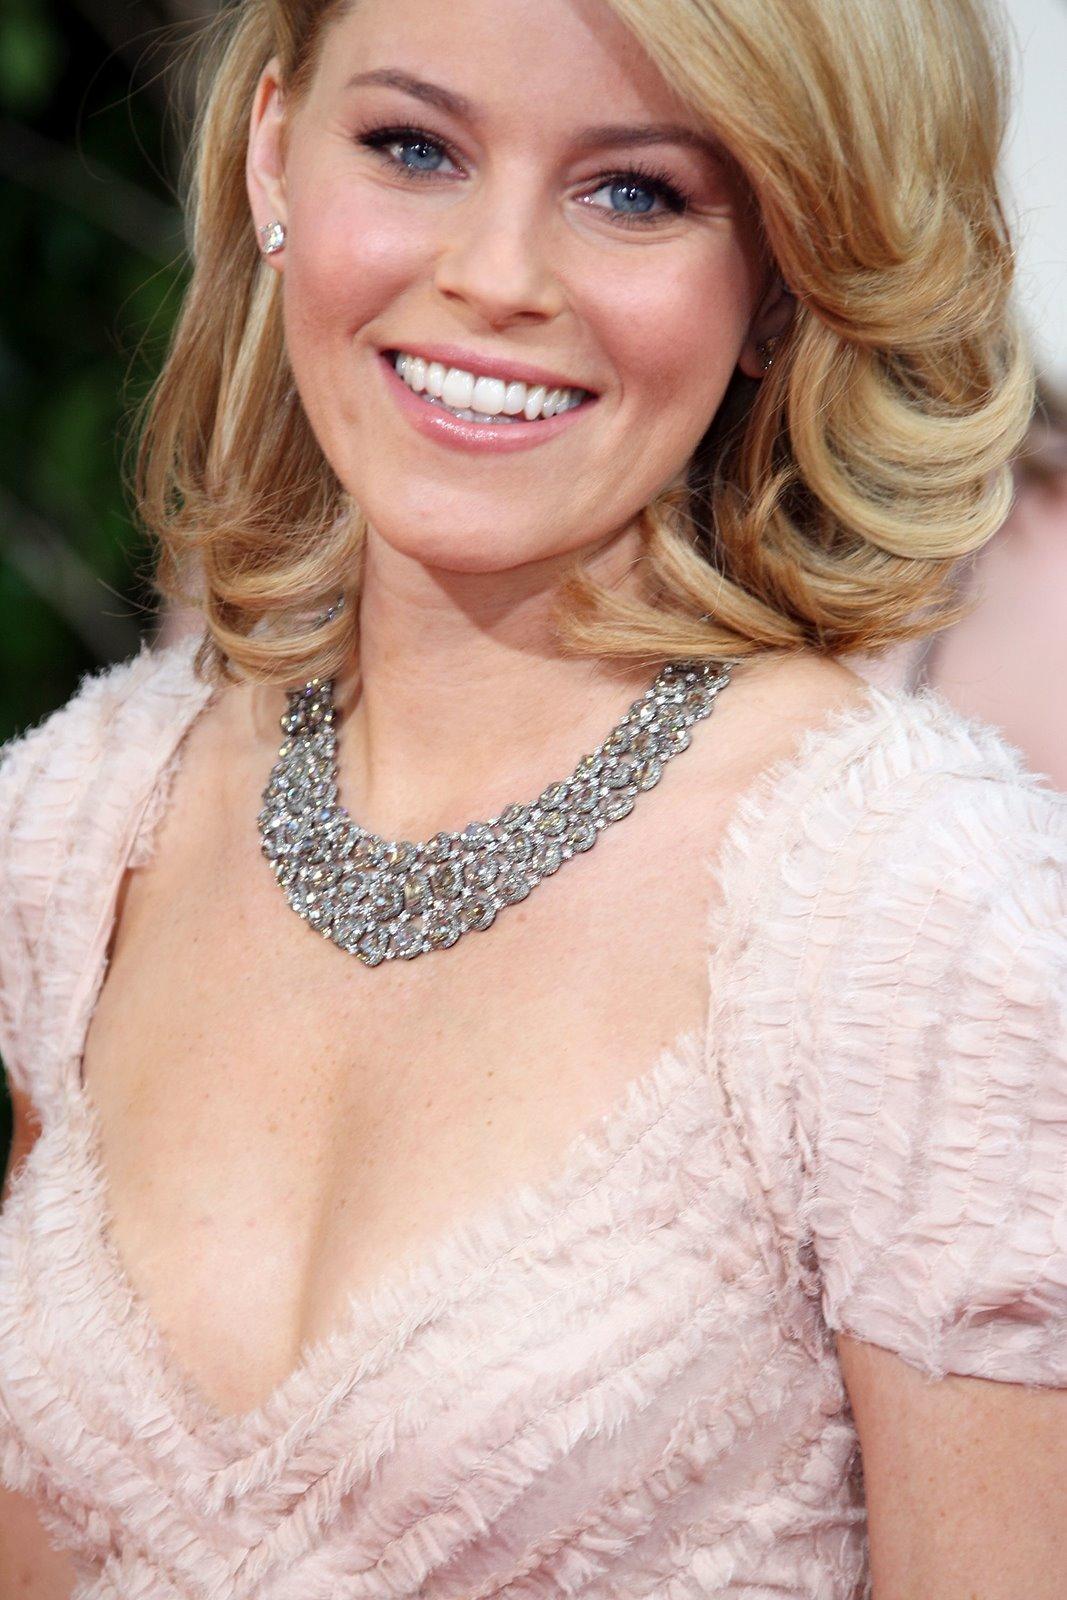 http://2.bp.blogspot.com/-EZygrypBGFs/Ths4i3yvKqI/AAAAAAAAAMM/4P-LoZ2HaK8/s1600/elizabeth_banks_golden_globes_getty_images.jpg